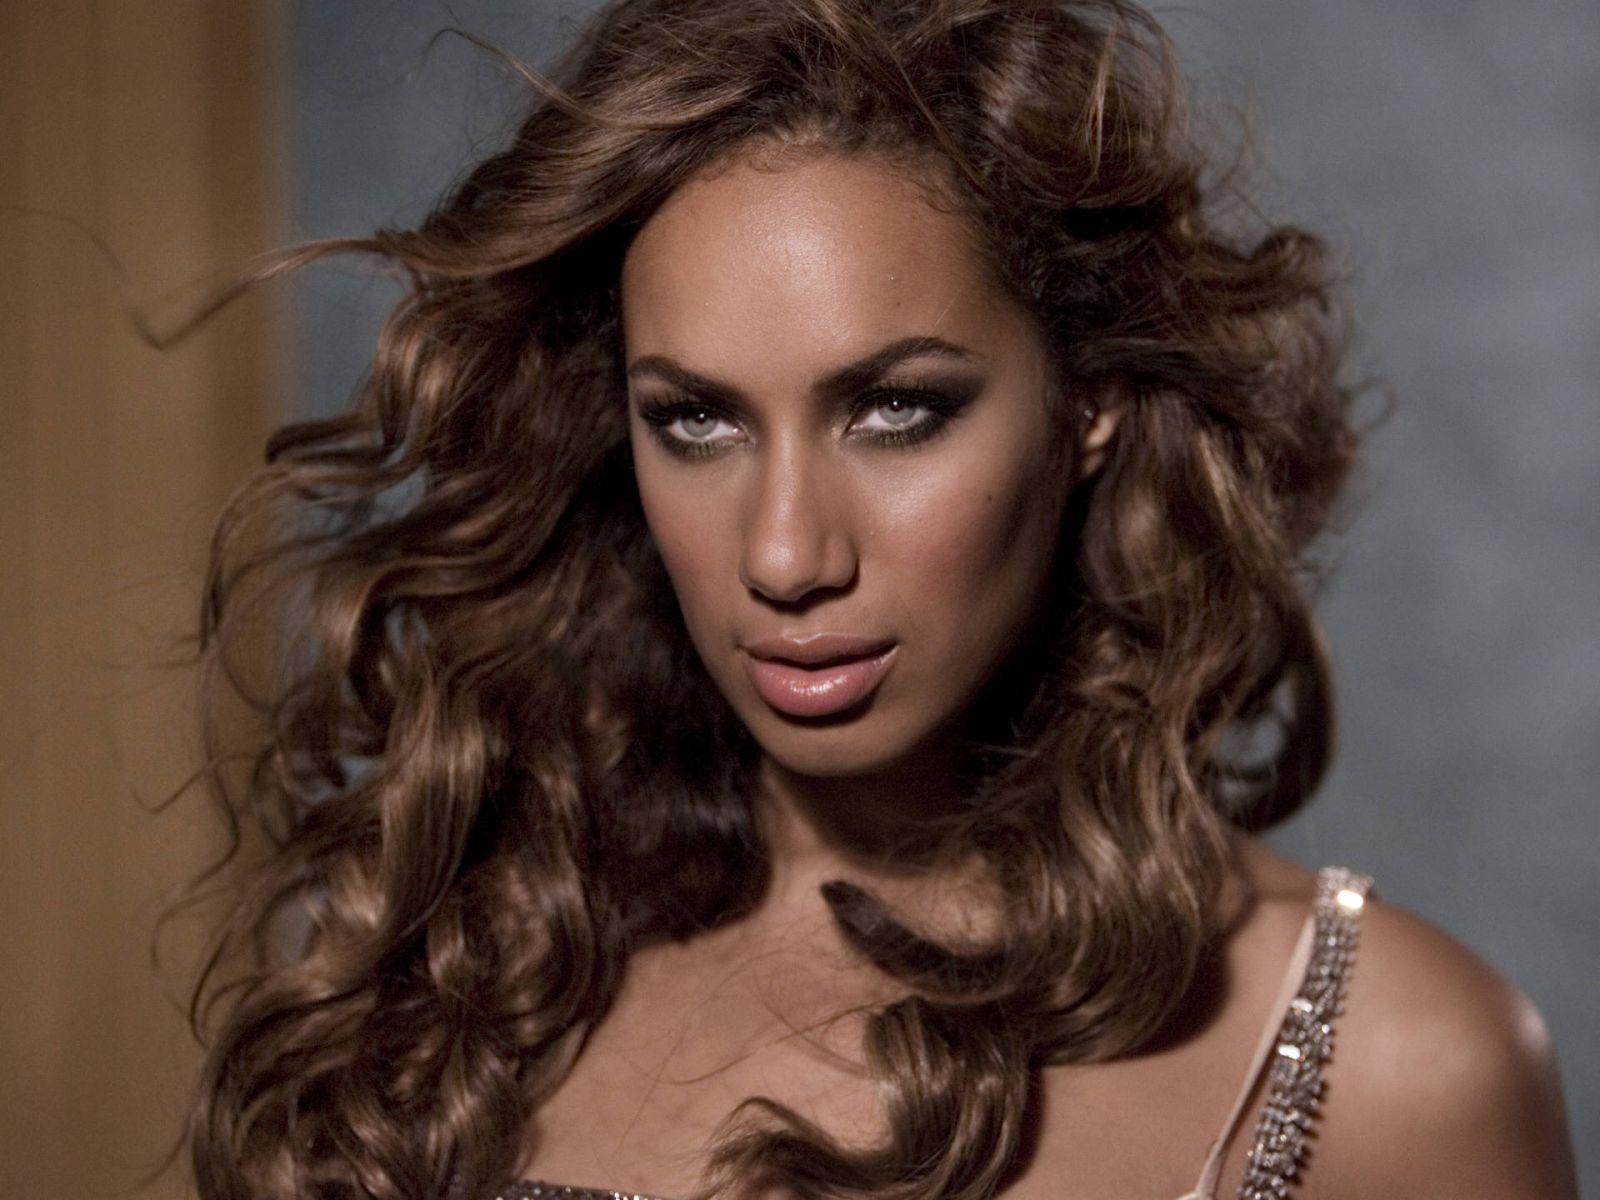 Leona Lewis Backgrounds, Compatible - PC, Mobile, Gadgets| 1600x1200 px